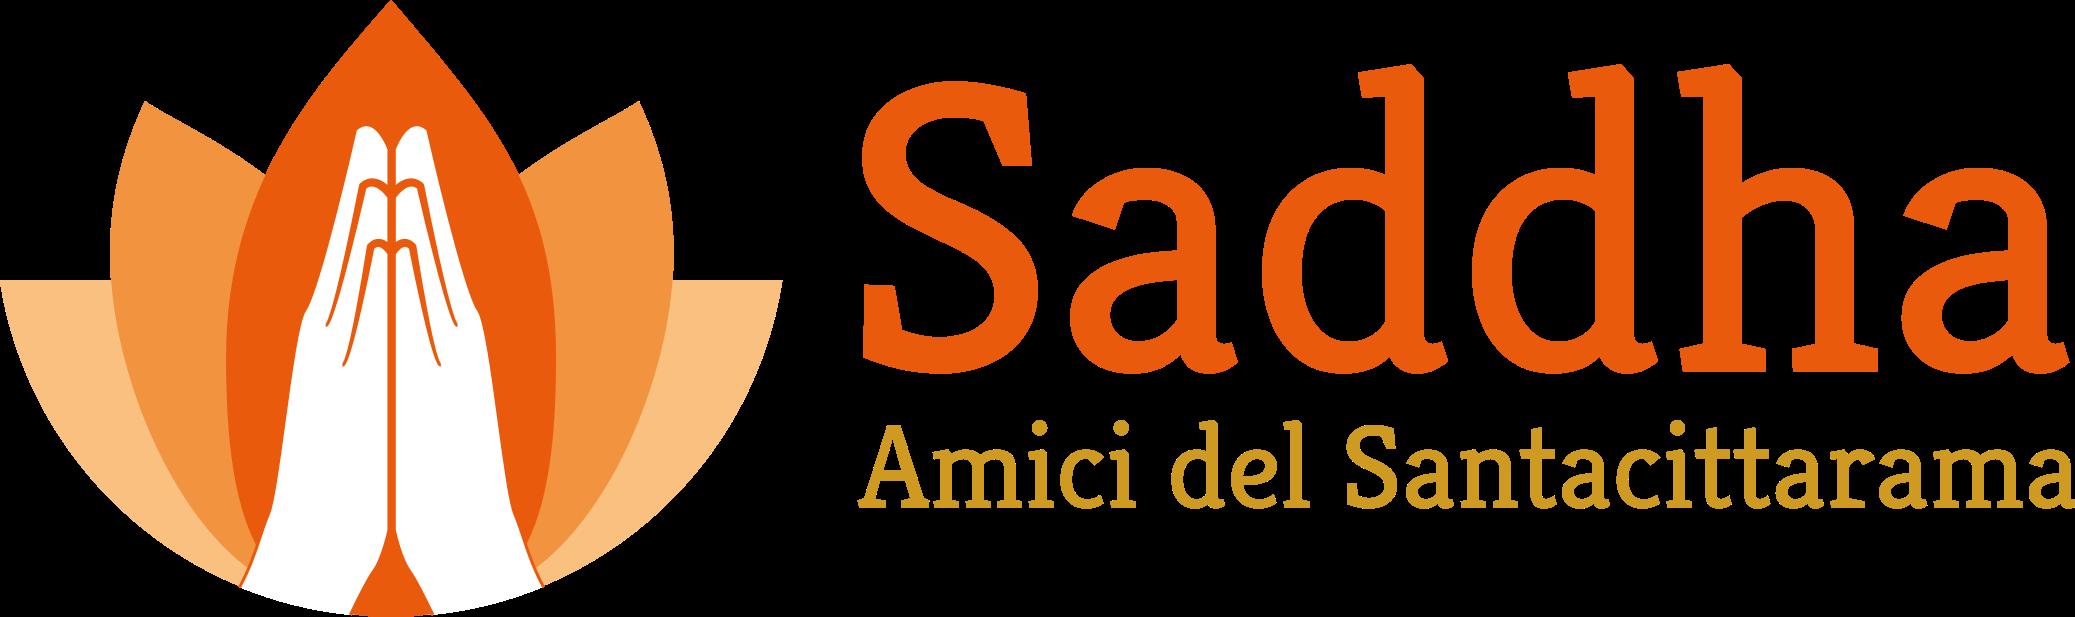 Saddha